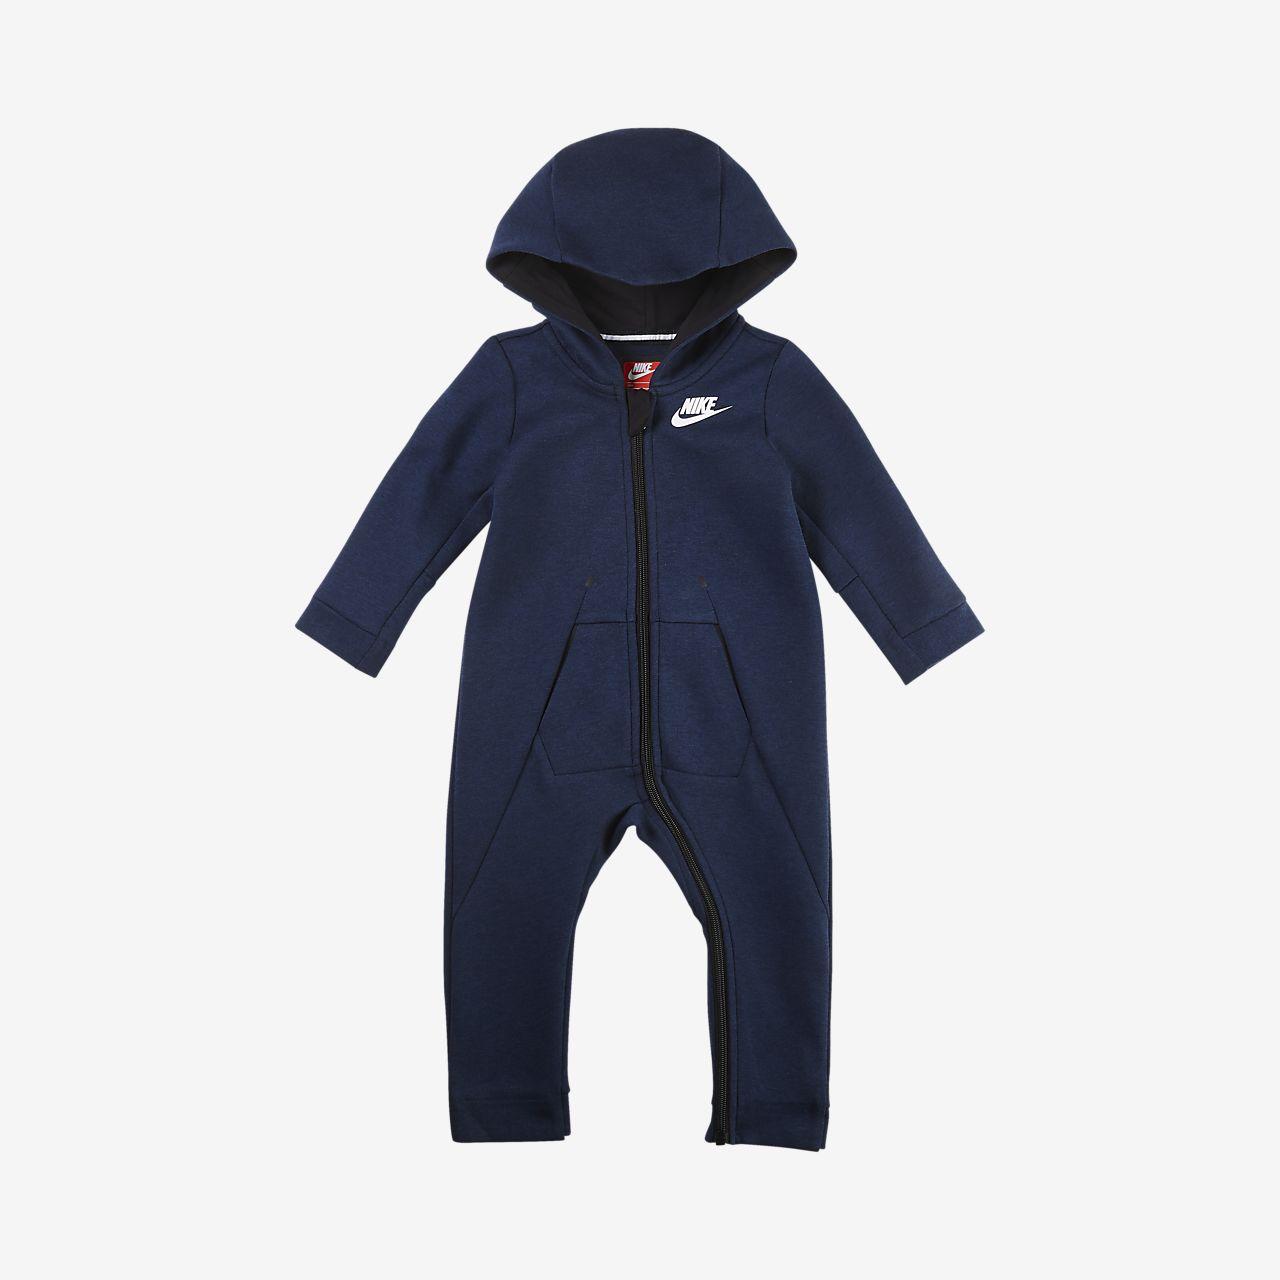 Nike Sportswear Tech Fleece Granota amb caputxa - Nadó (12-24 M)